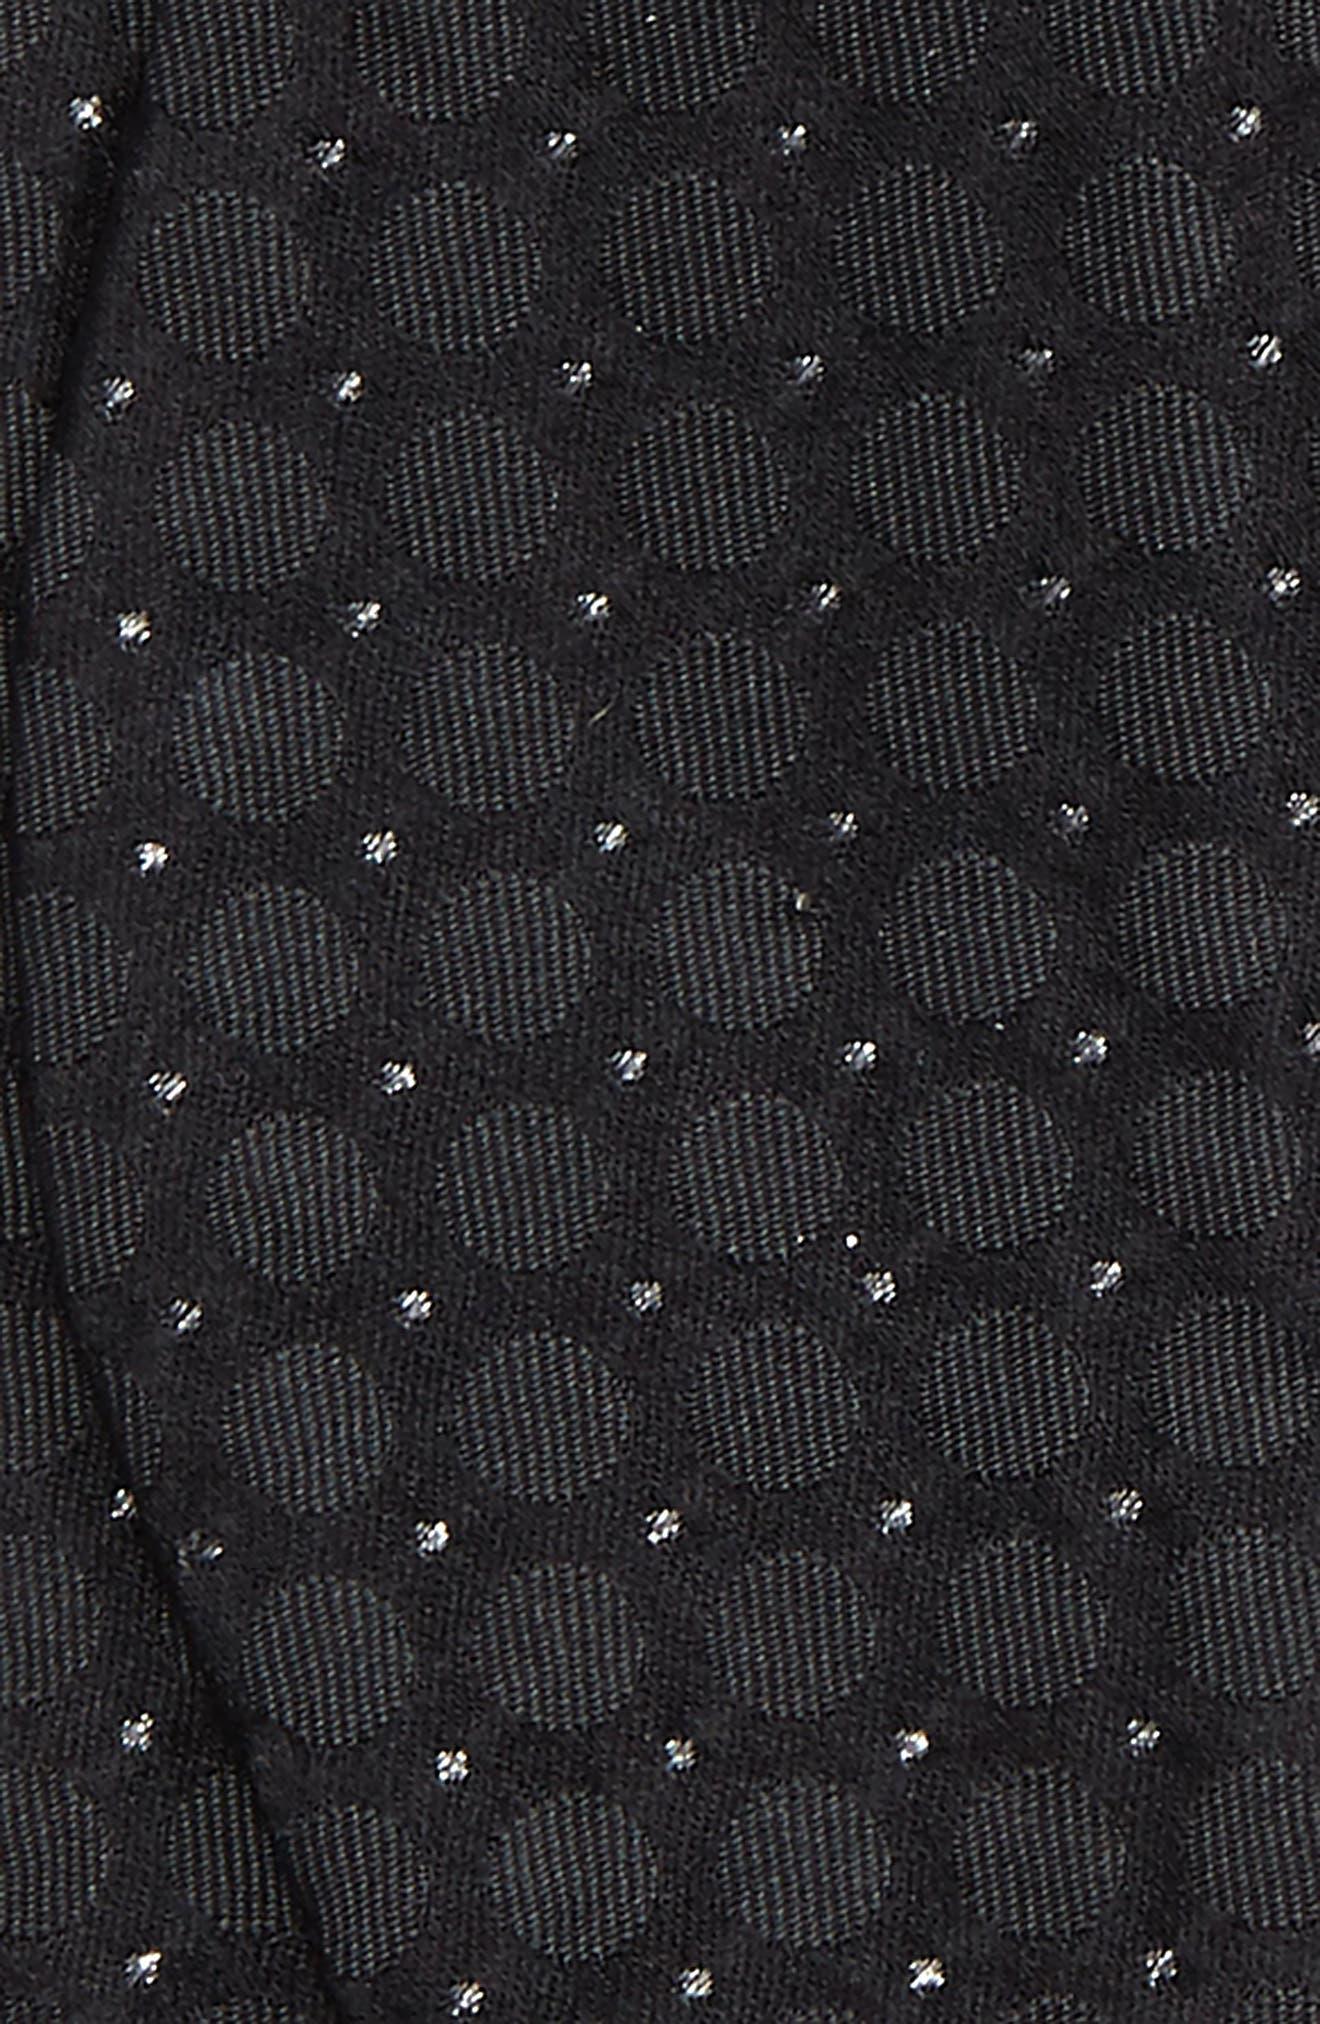 Black Shimmer Bow Tie,                             Alternate thumbnail 3, color,                             001